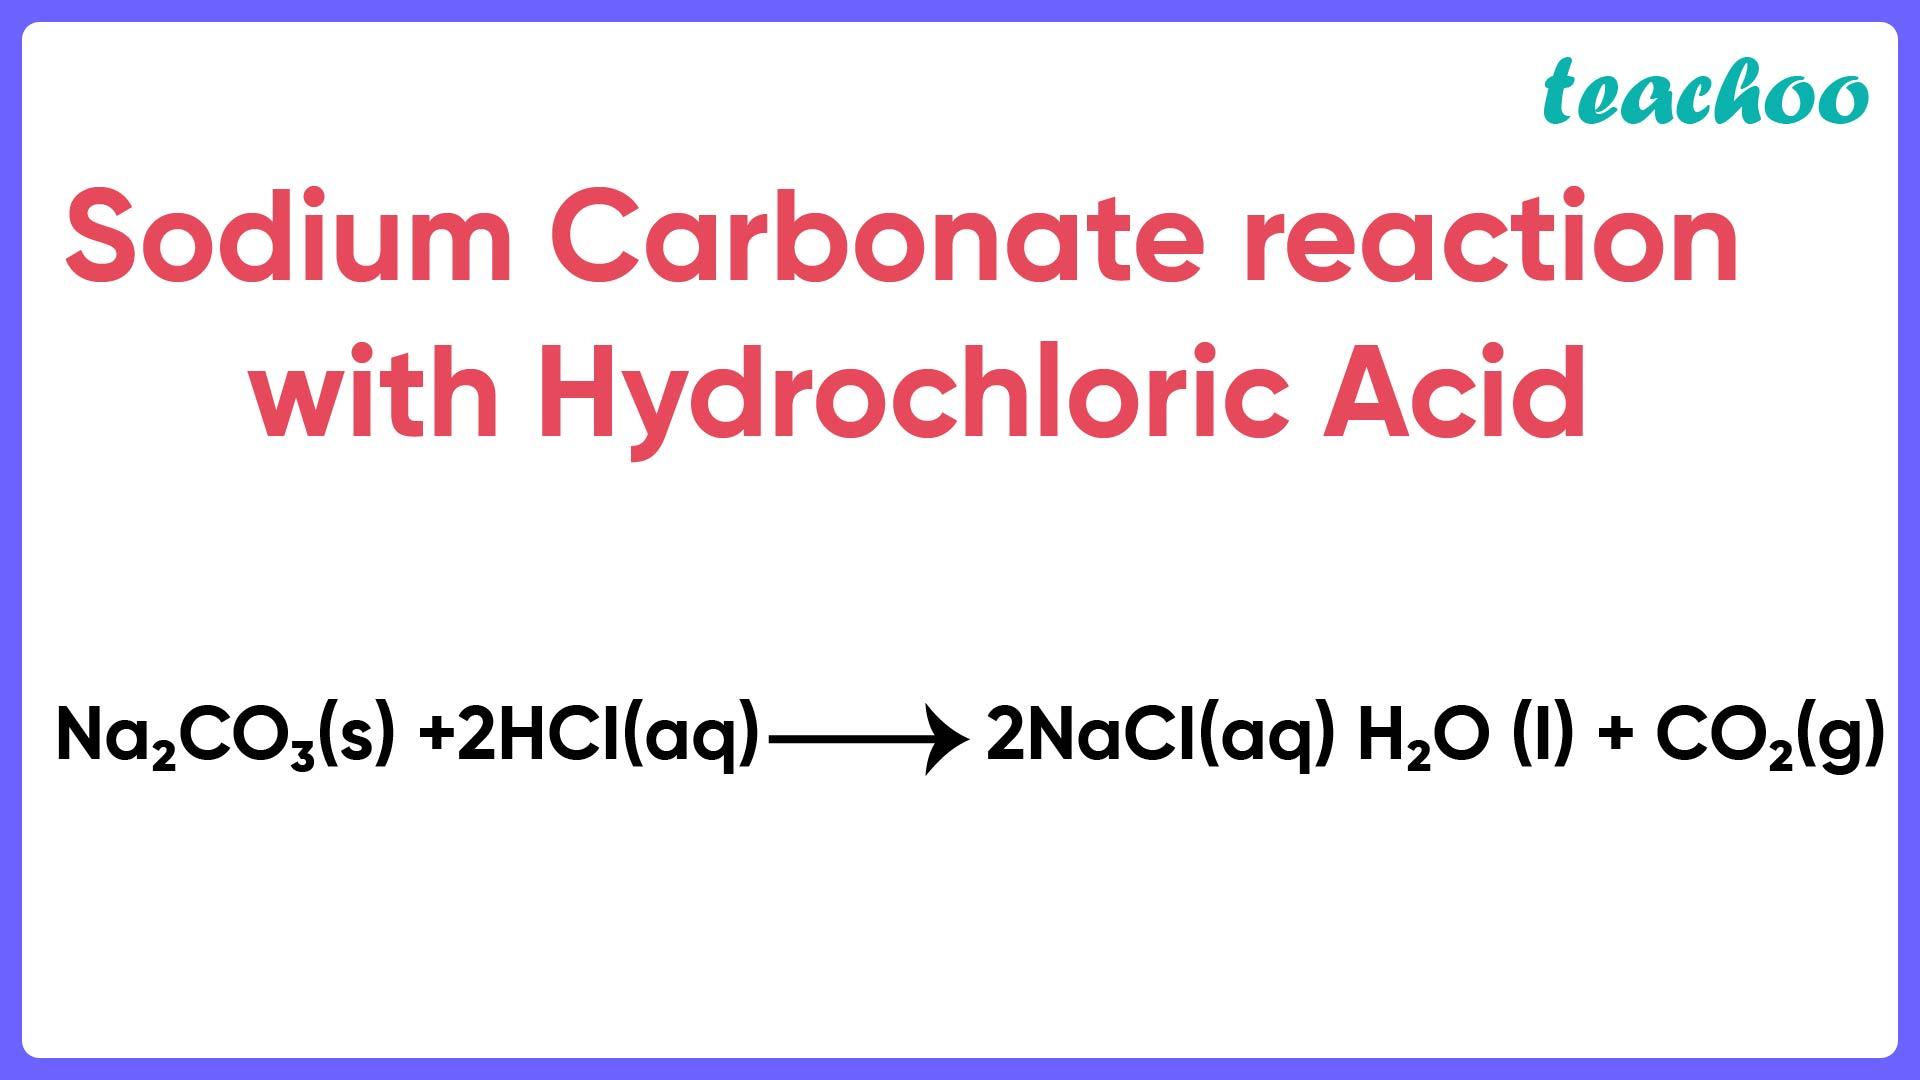 Sodium Carbonate reaction with Hydrochloric Acid - Teachoo.jpg